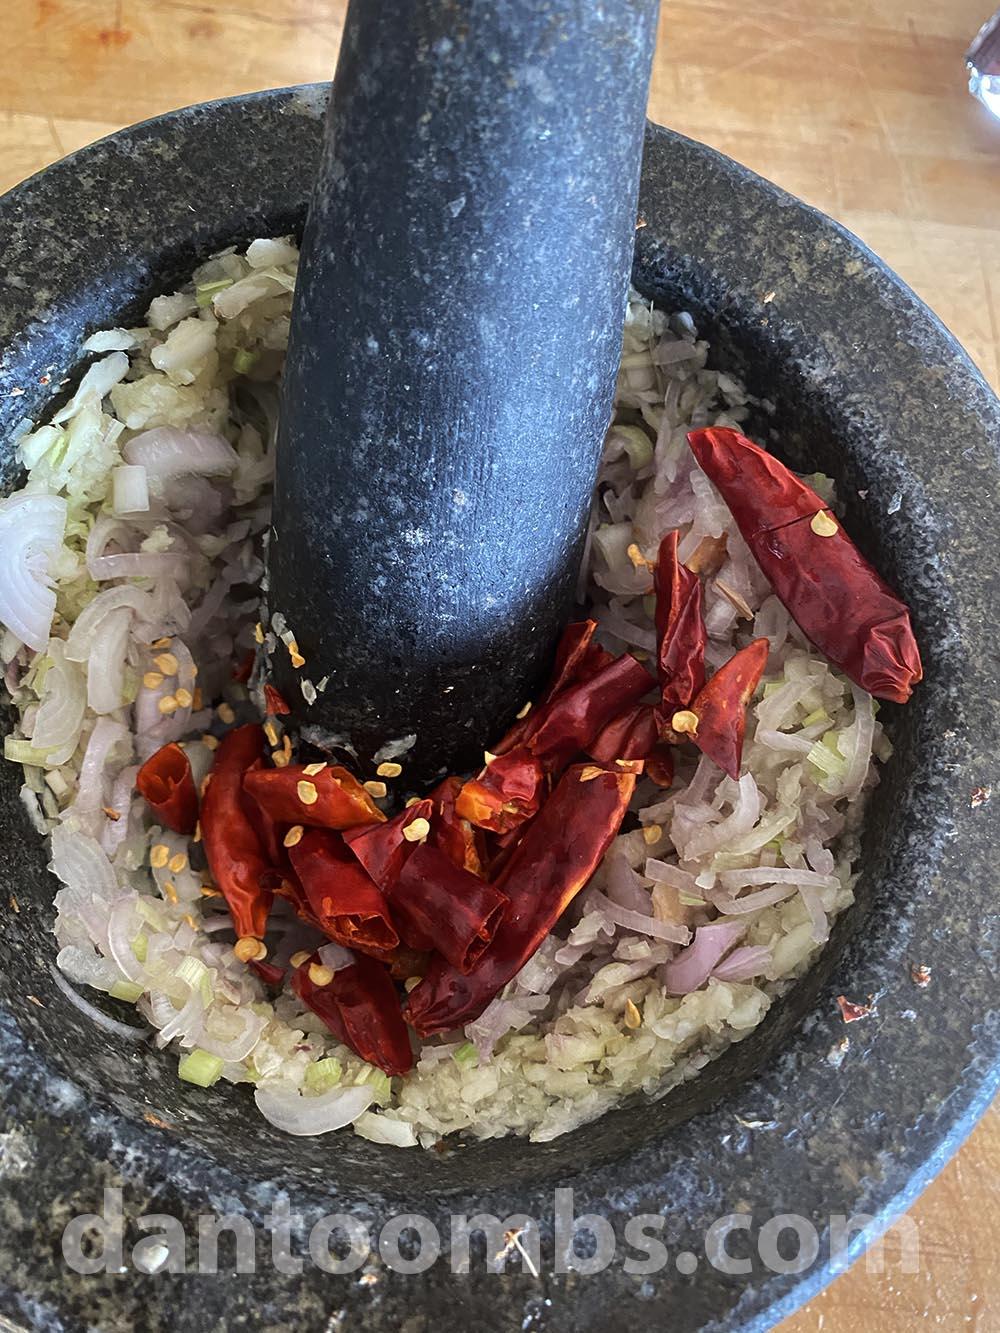 Pounding chillies